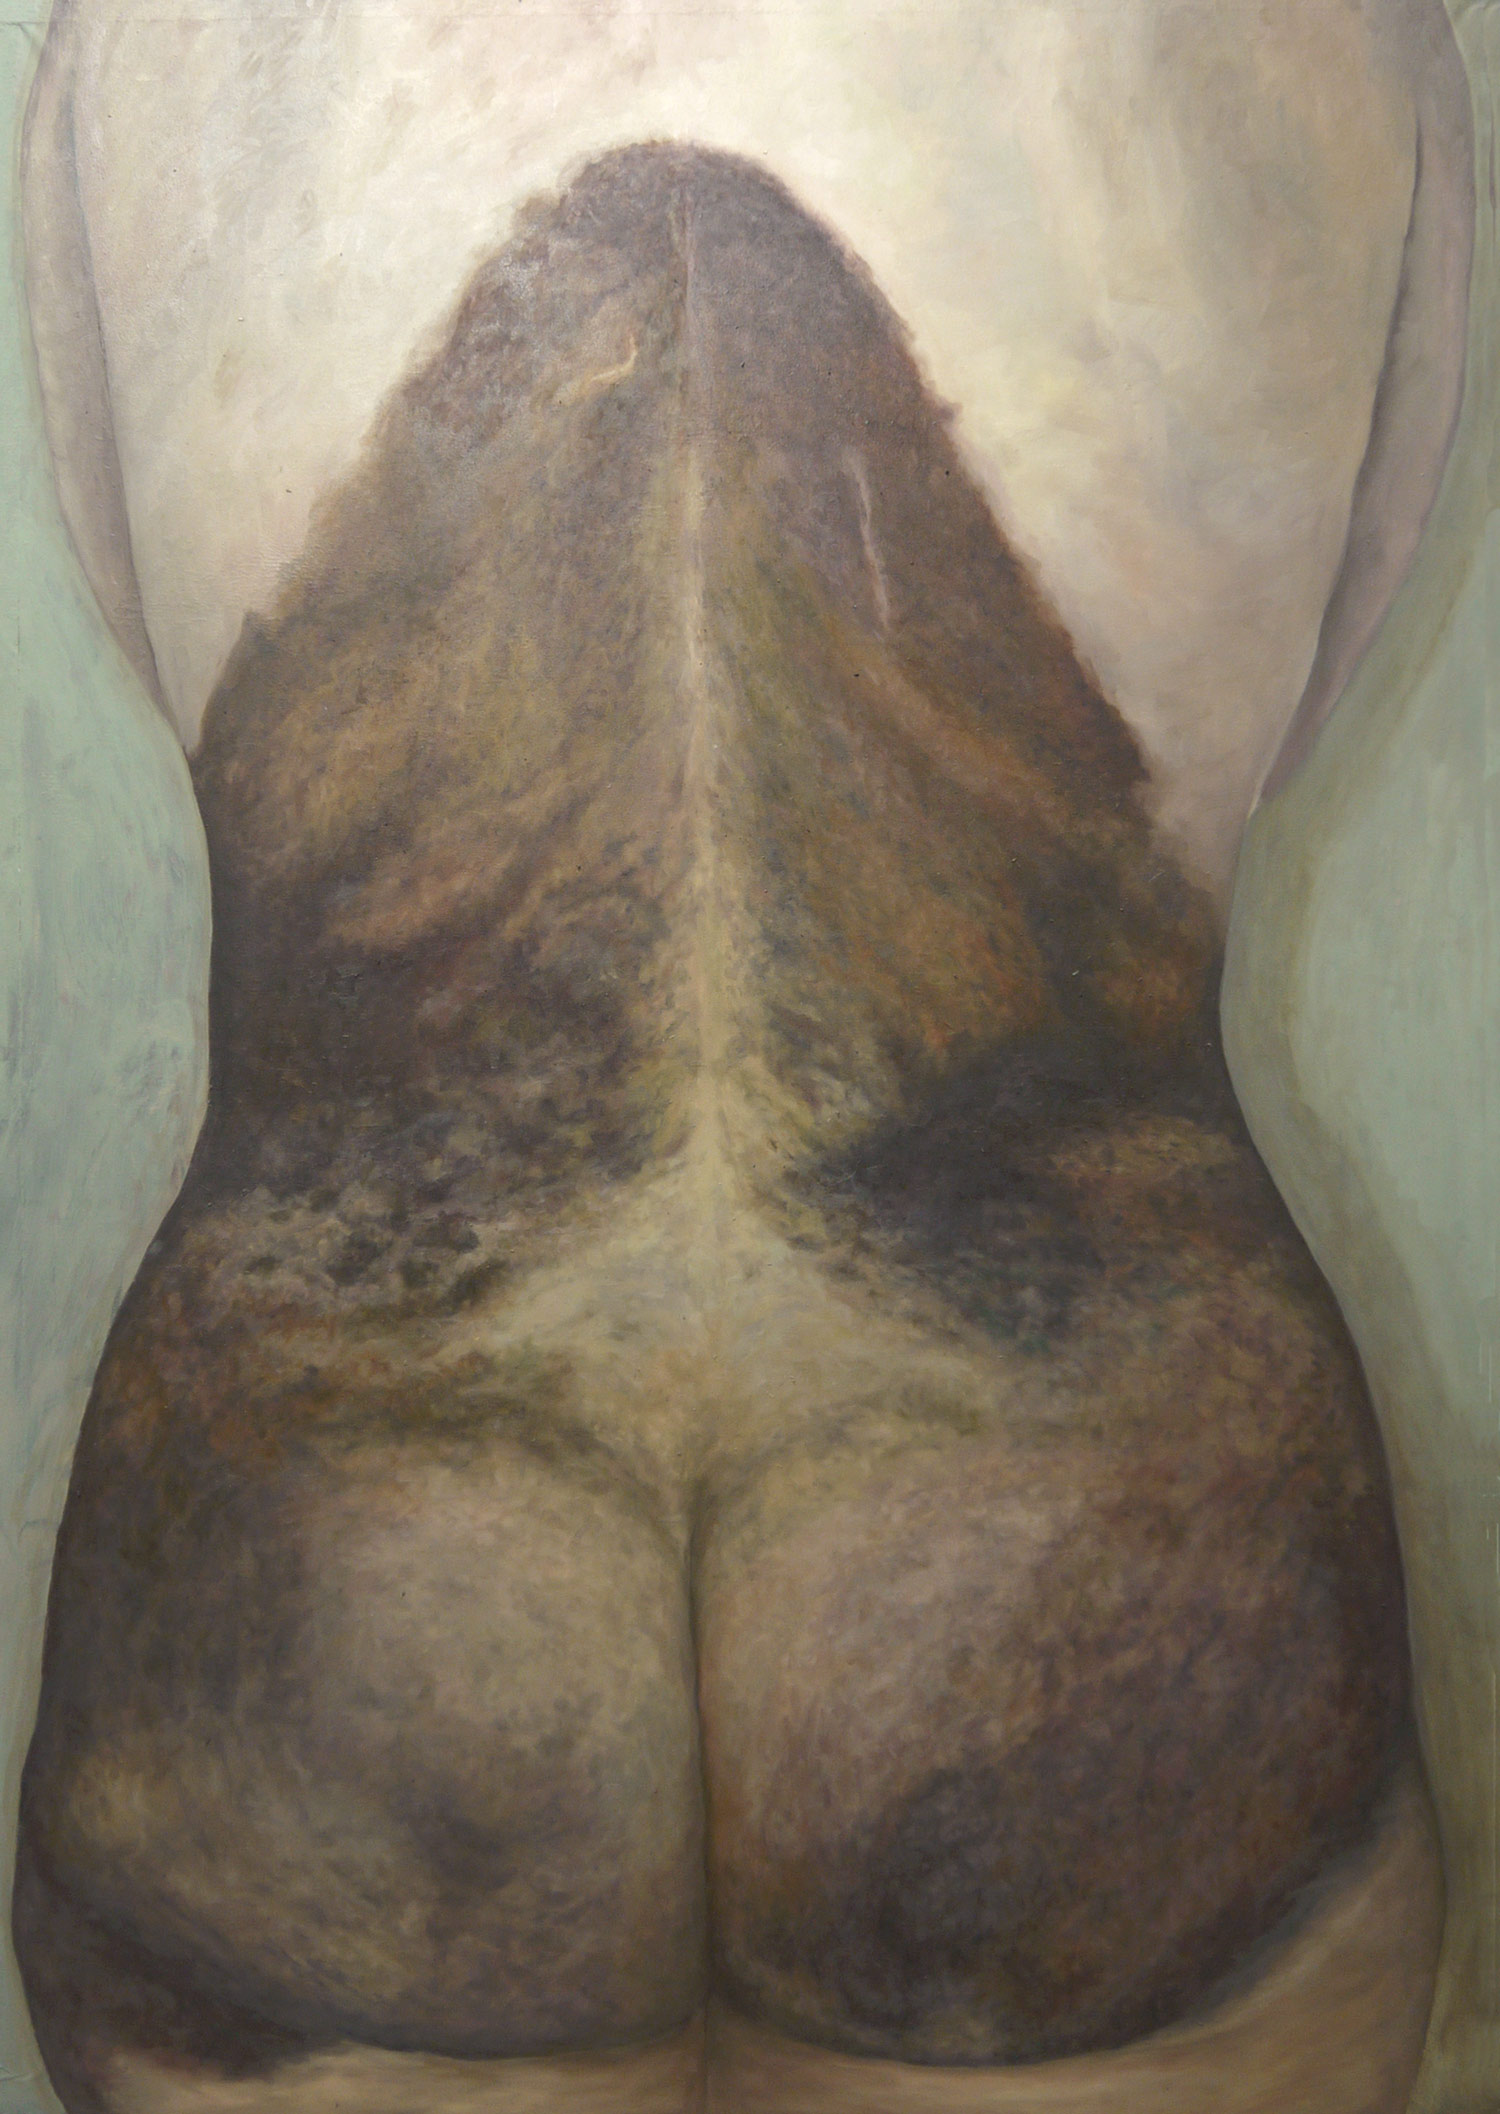 Laura Link . Neavus Flammerus Gigantus 3 . 2014 . Öl auf Leinwand . 170 x 120